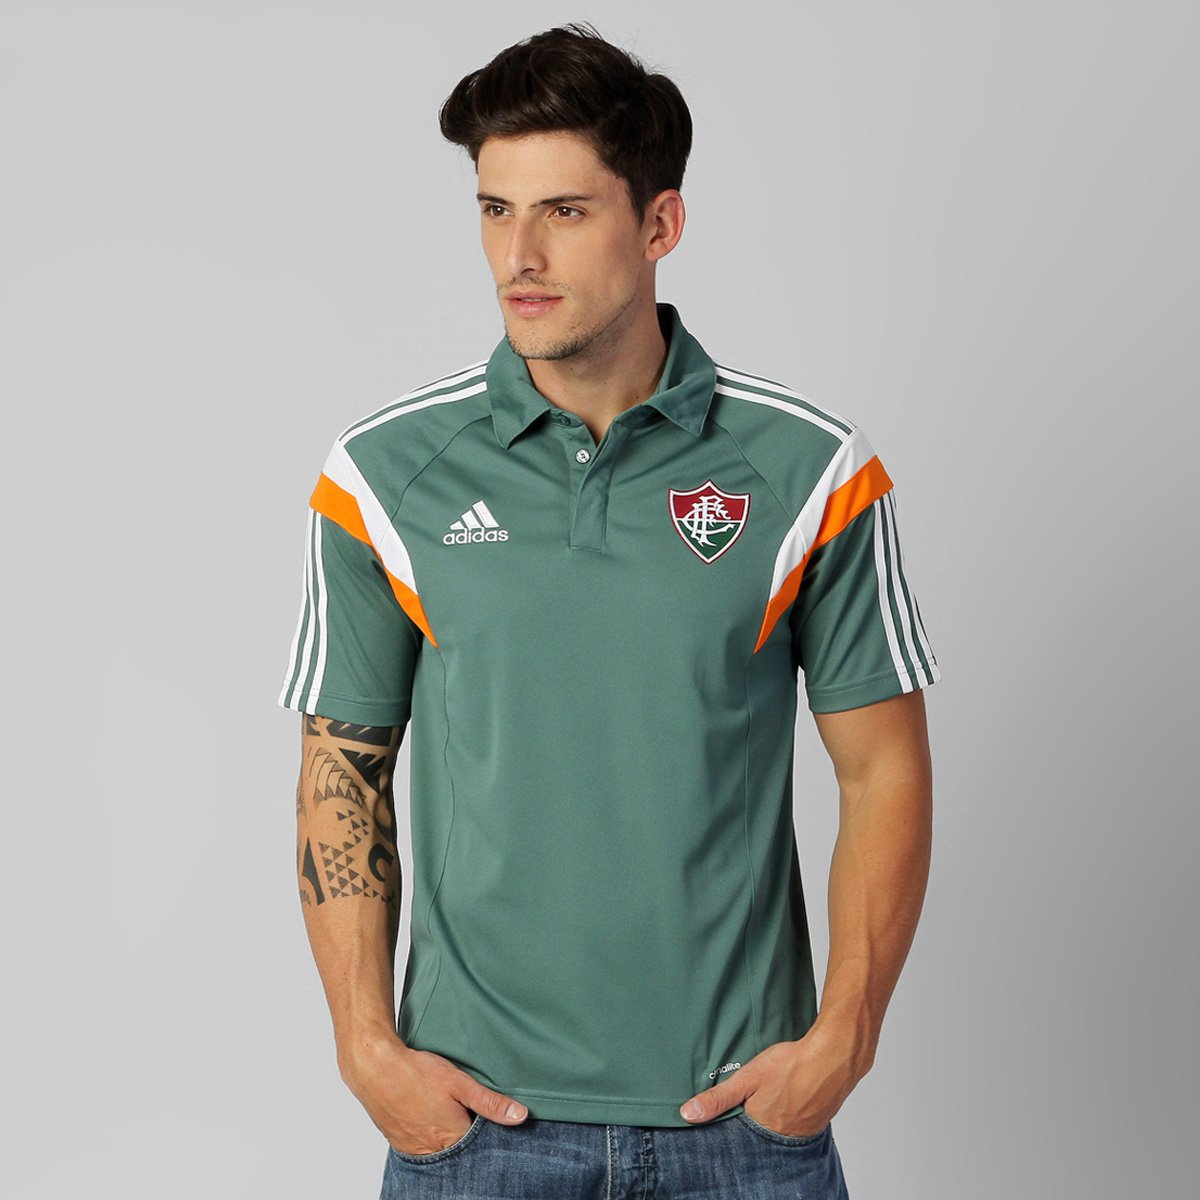 Camisa Polo Adidas Fluminense Viagem 2014 - Compre Agora  5305b2adaa6c0